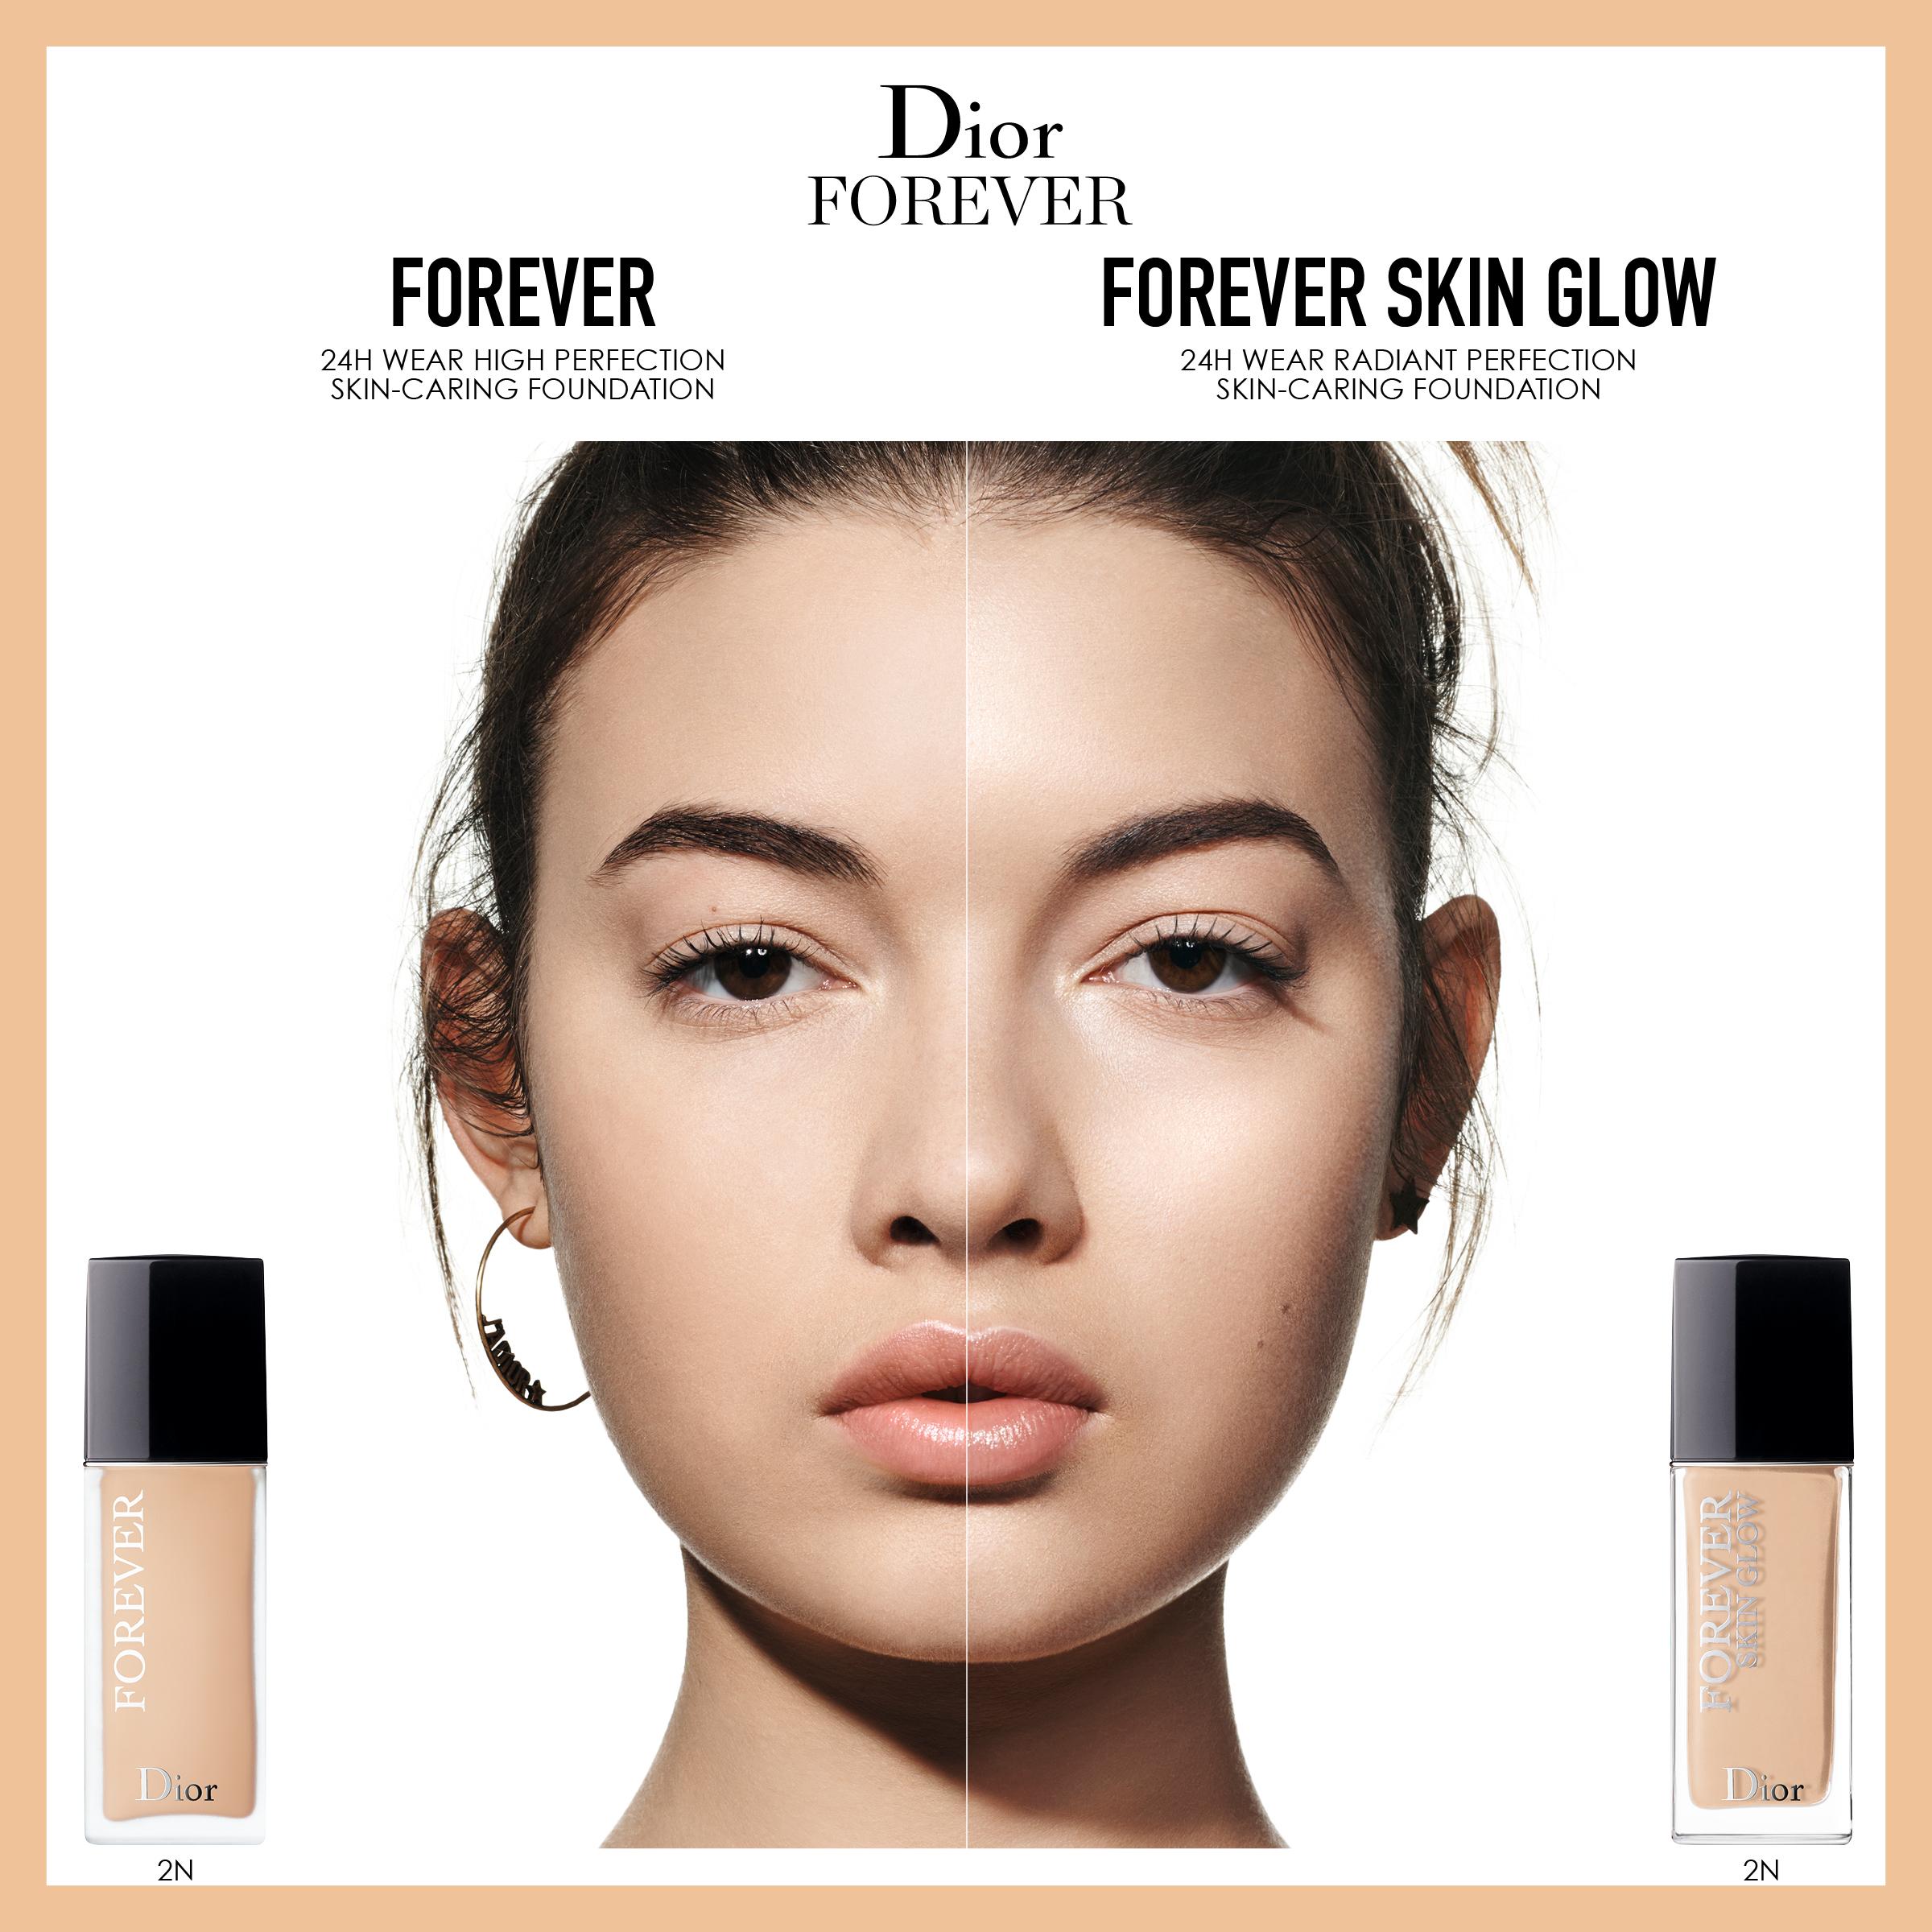 DIOR Forever Fluid Foundation, 1 Neutral